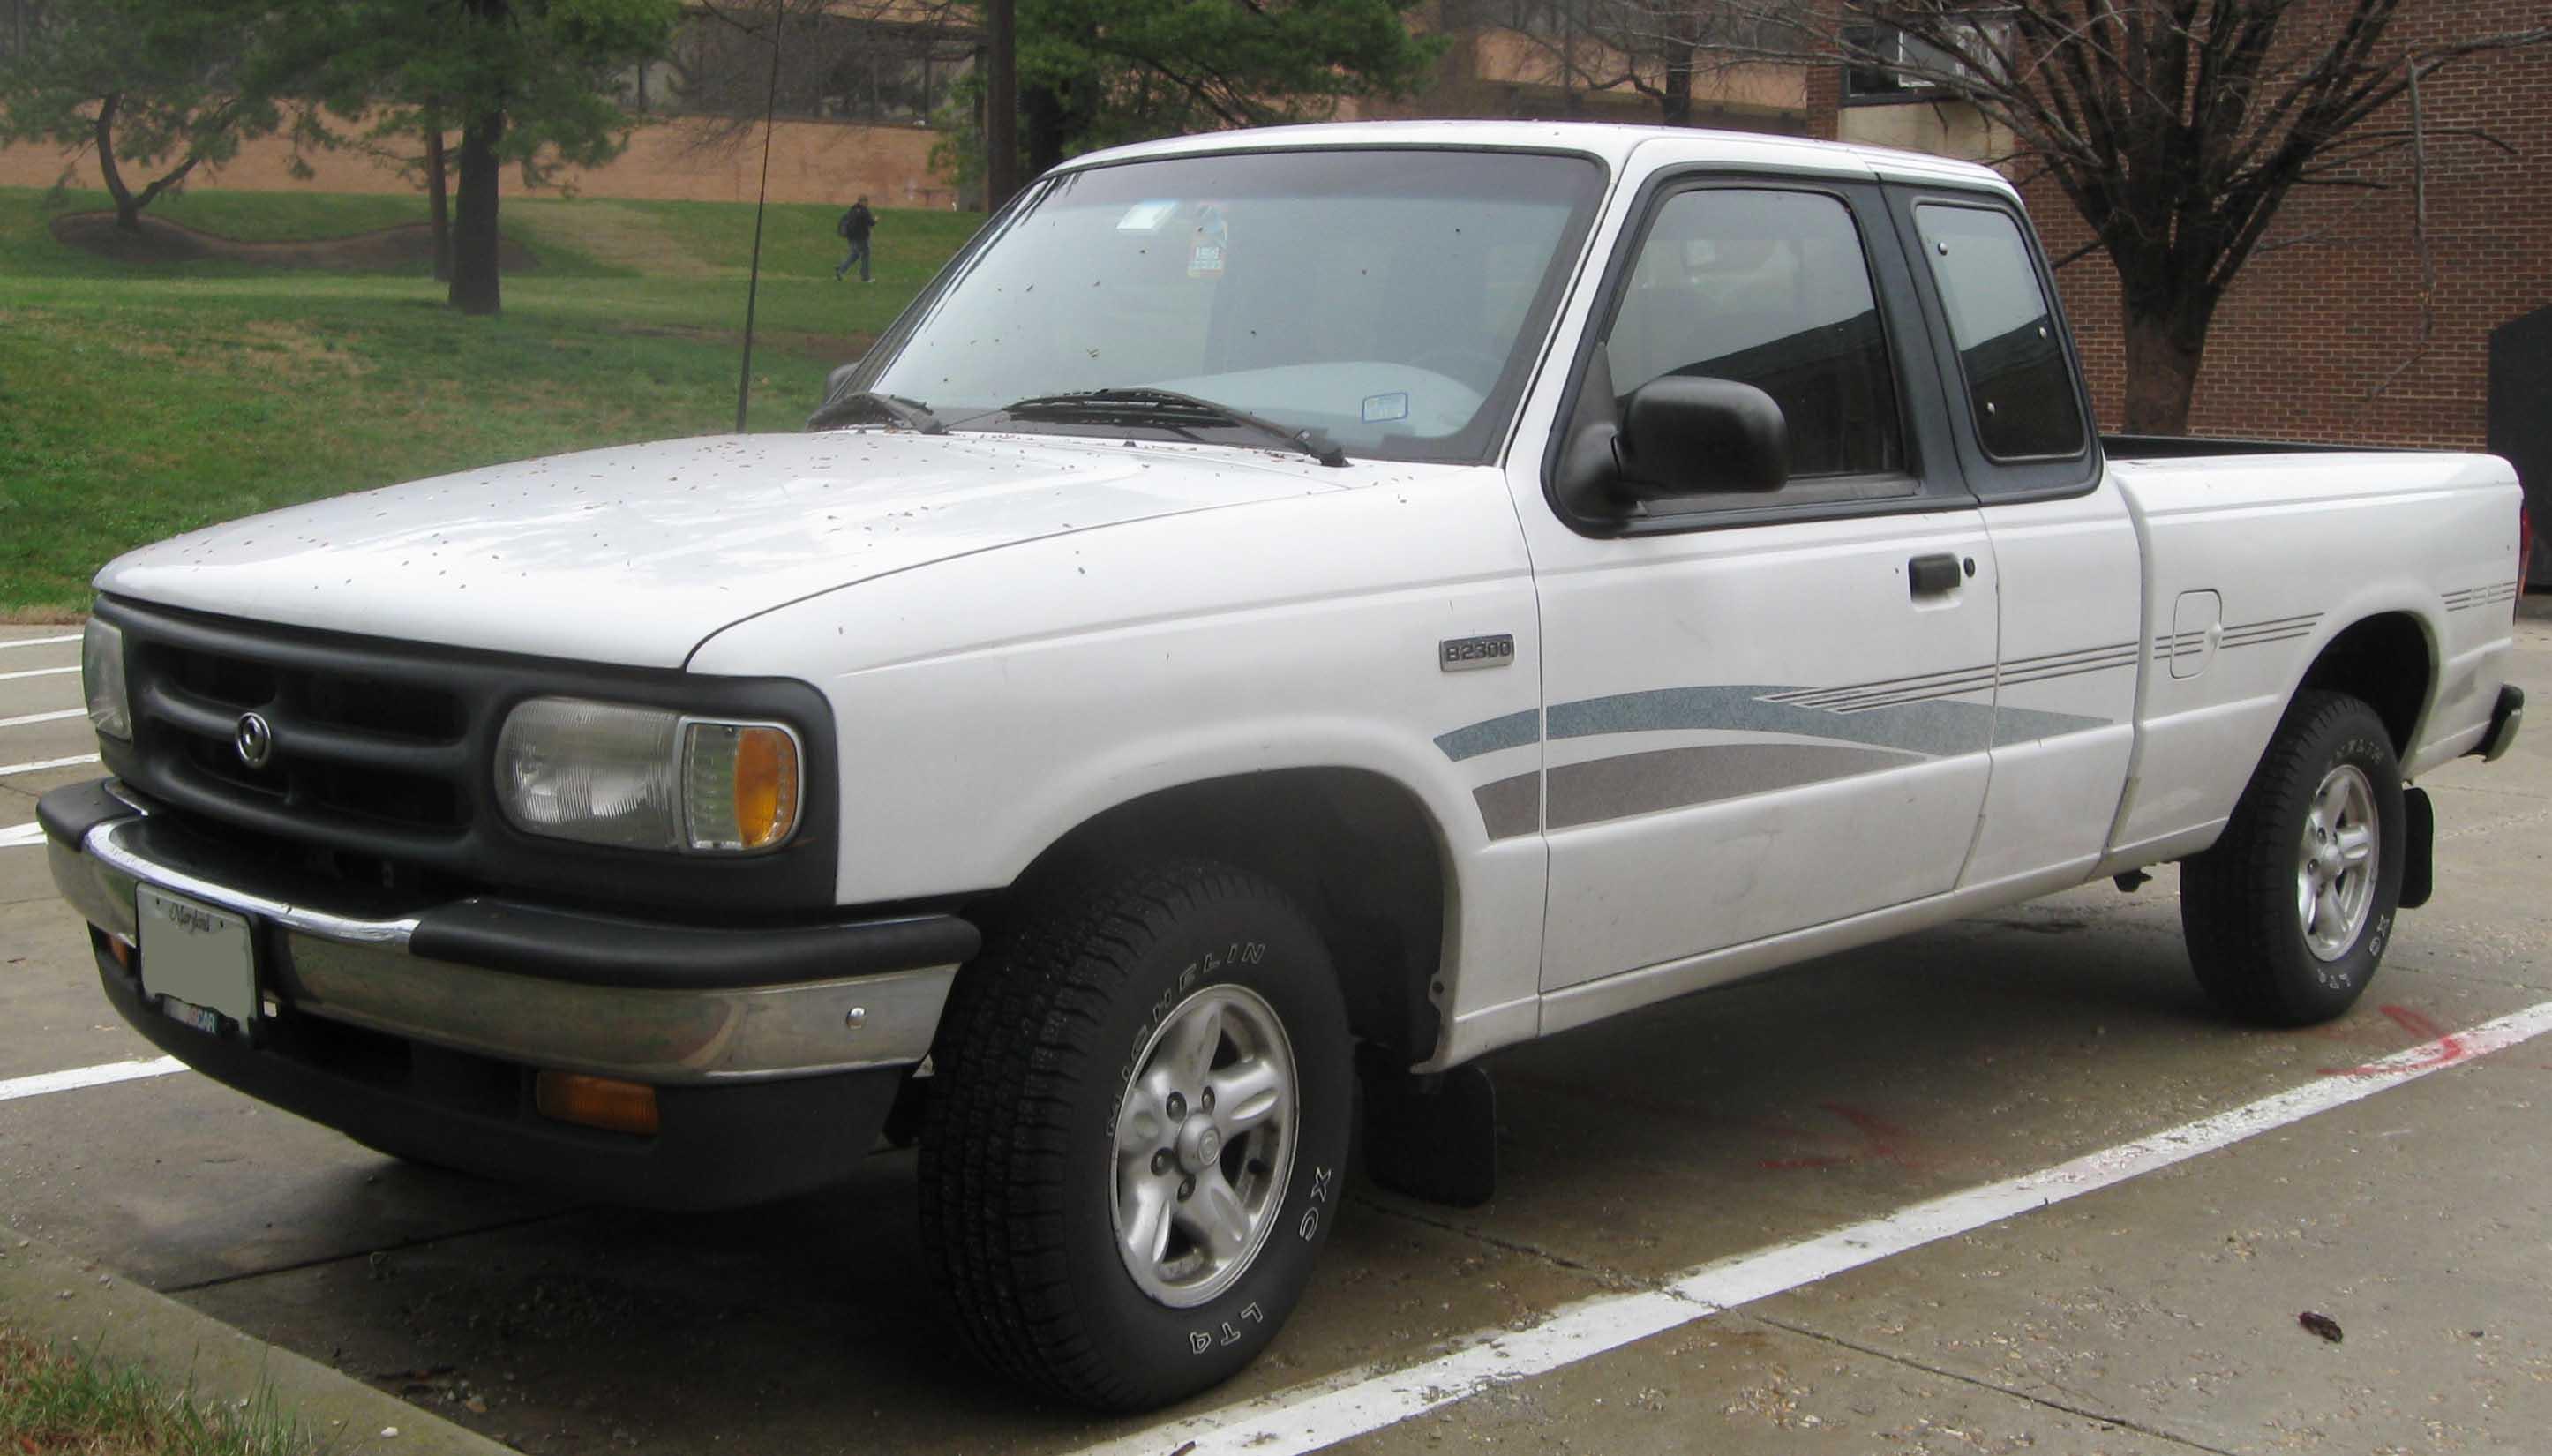 1990 Mazda B-Series Pickup - Information and photos - ZombieDrive